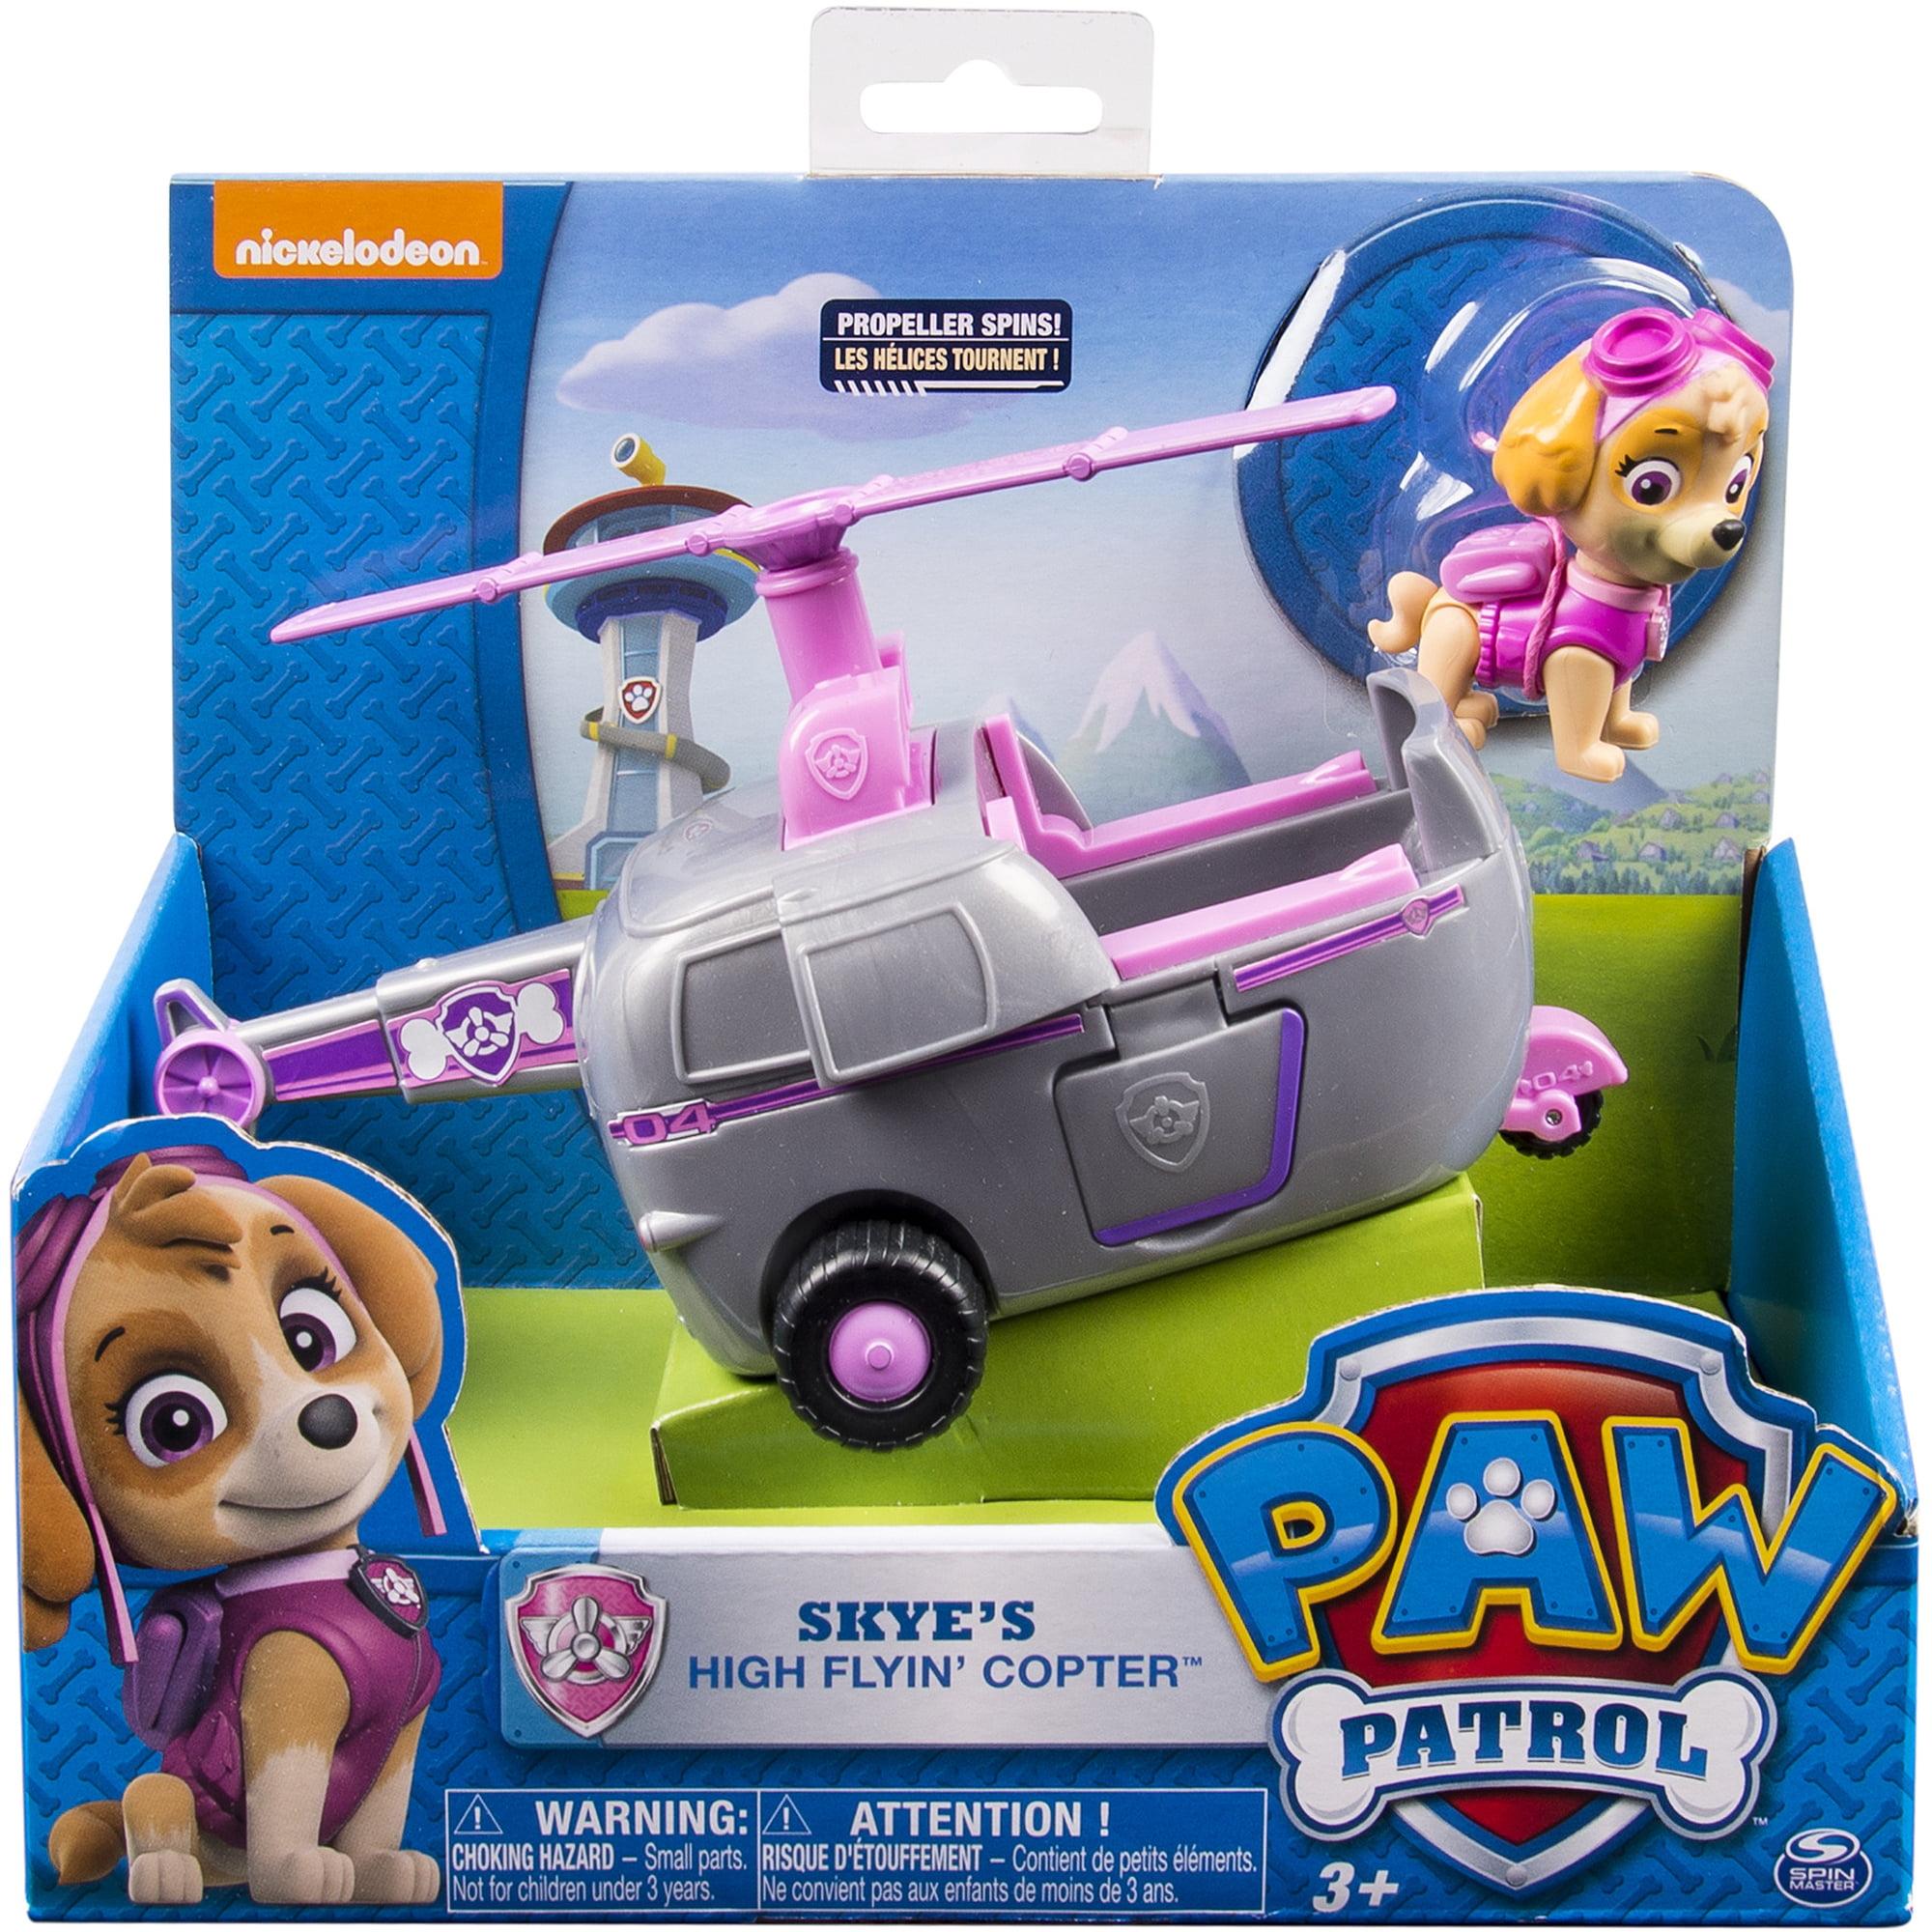 Paw Patrol Mission Paw Skye s Mission Helicopter Walmart